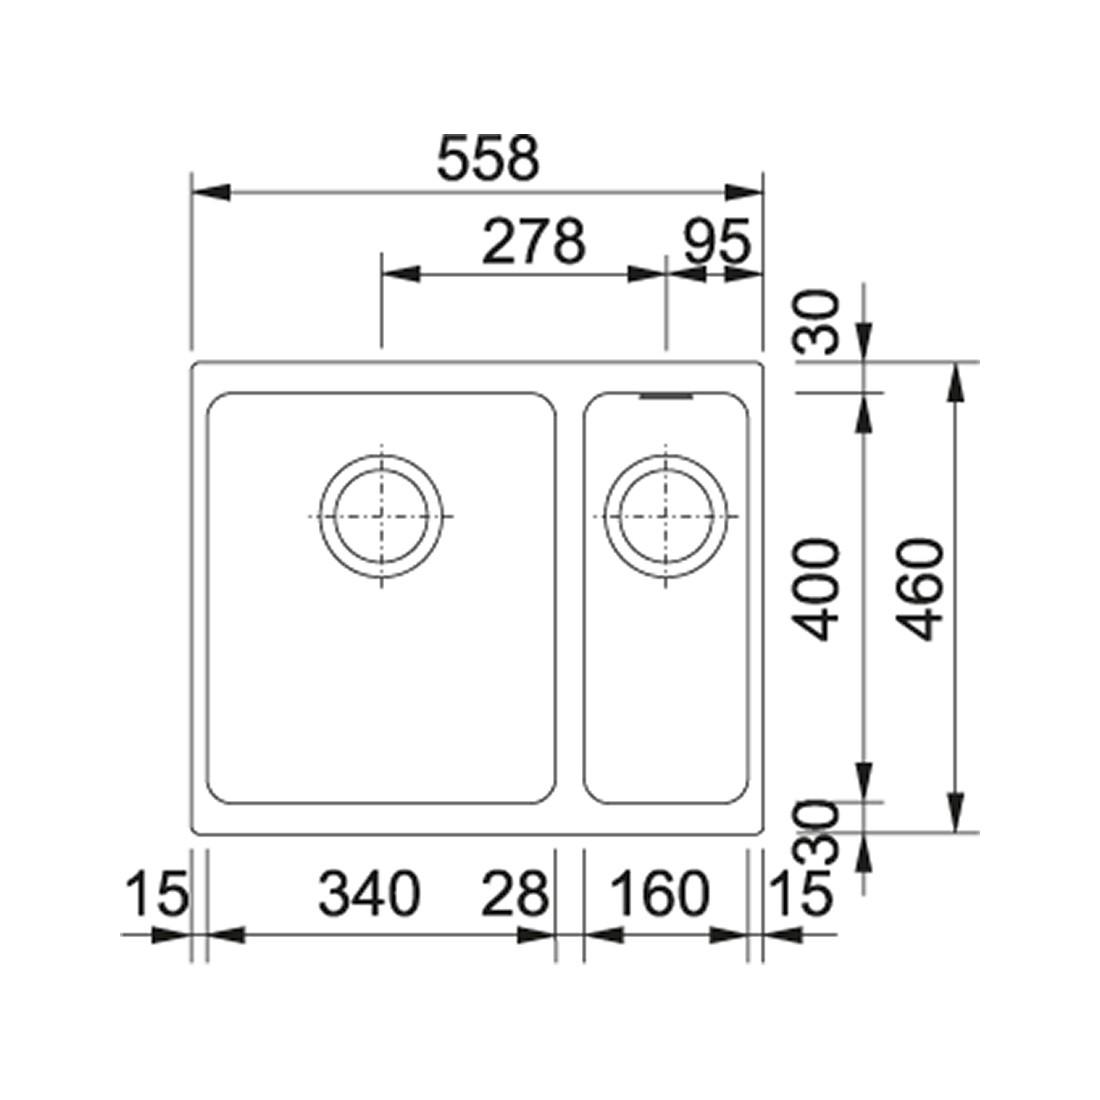 Akmens masės plautuvė Franke Kubus KBG 160, ekscentrinis ventilis, Graphit